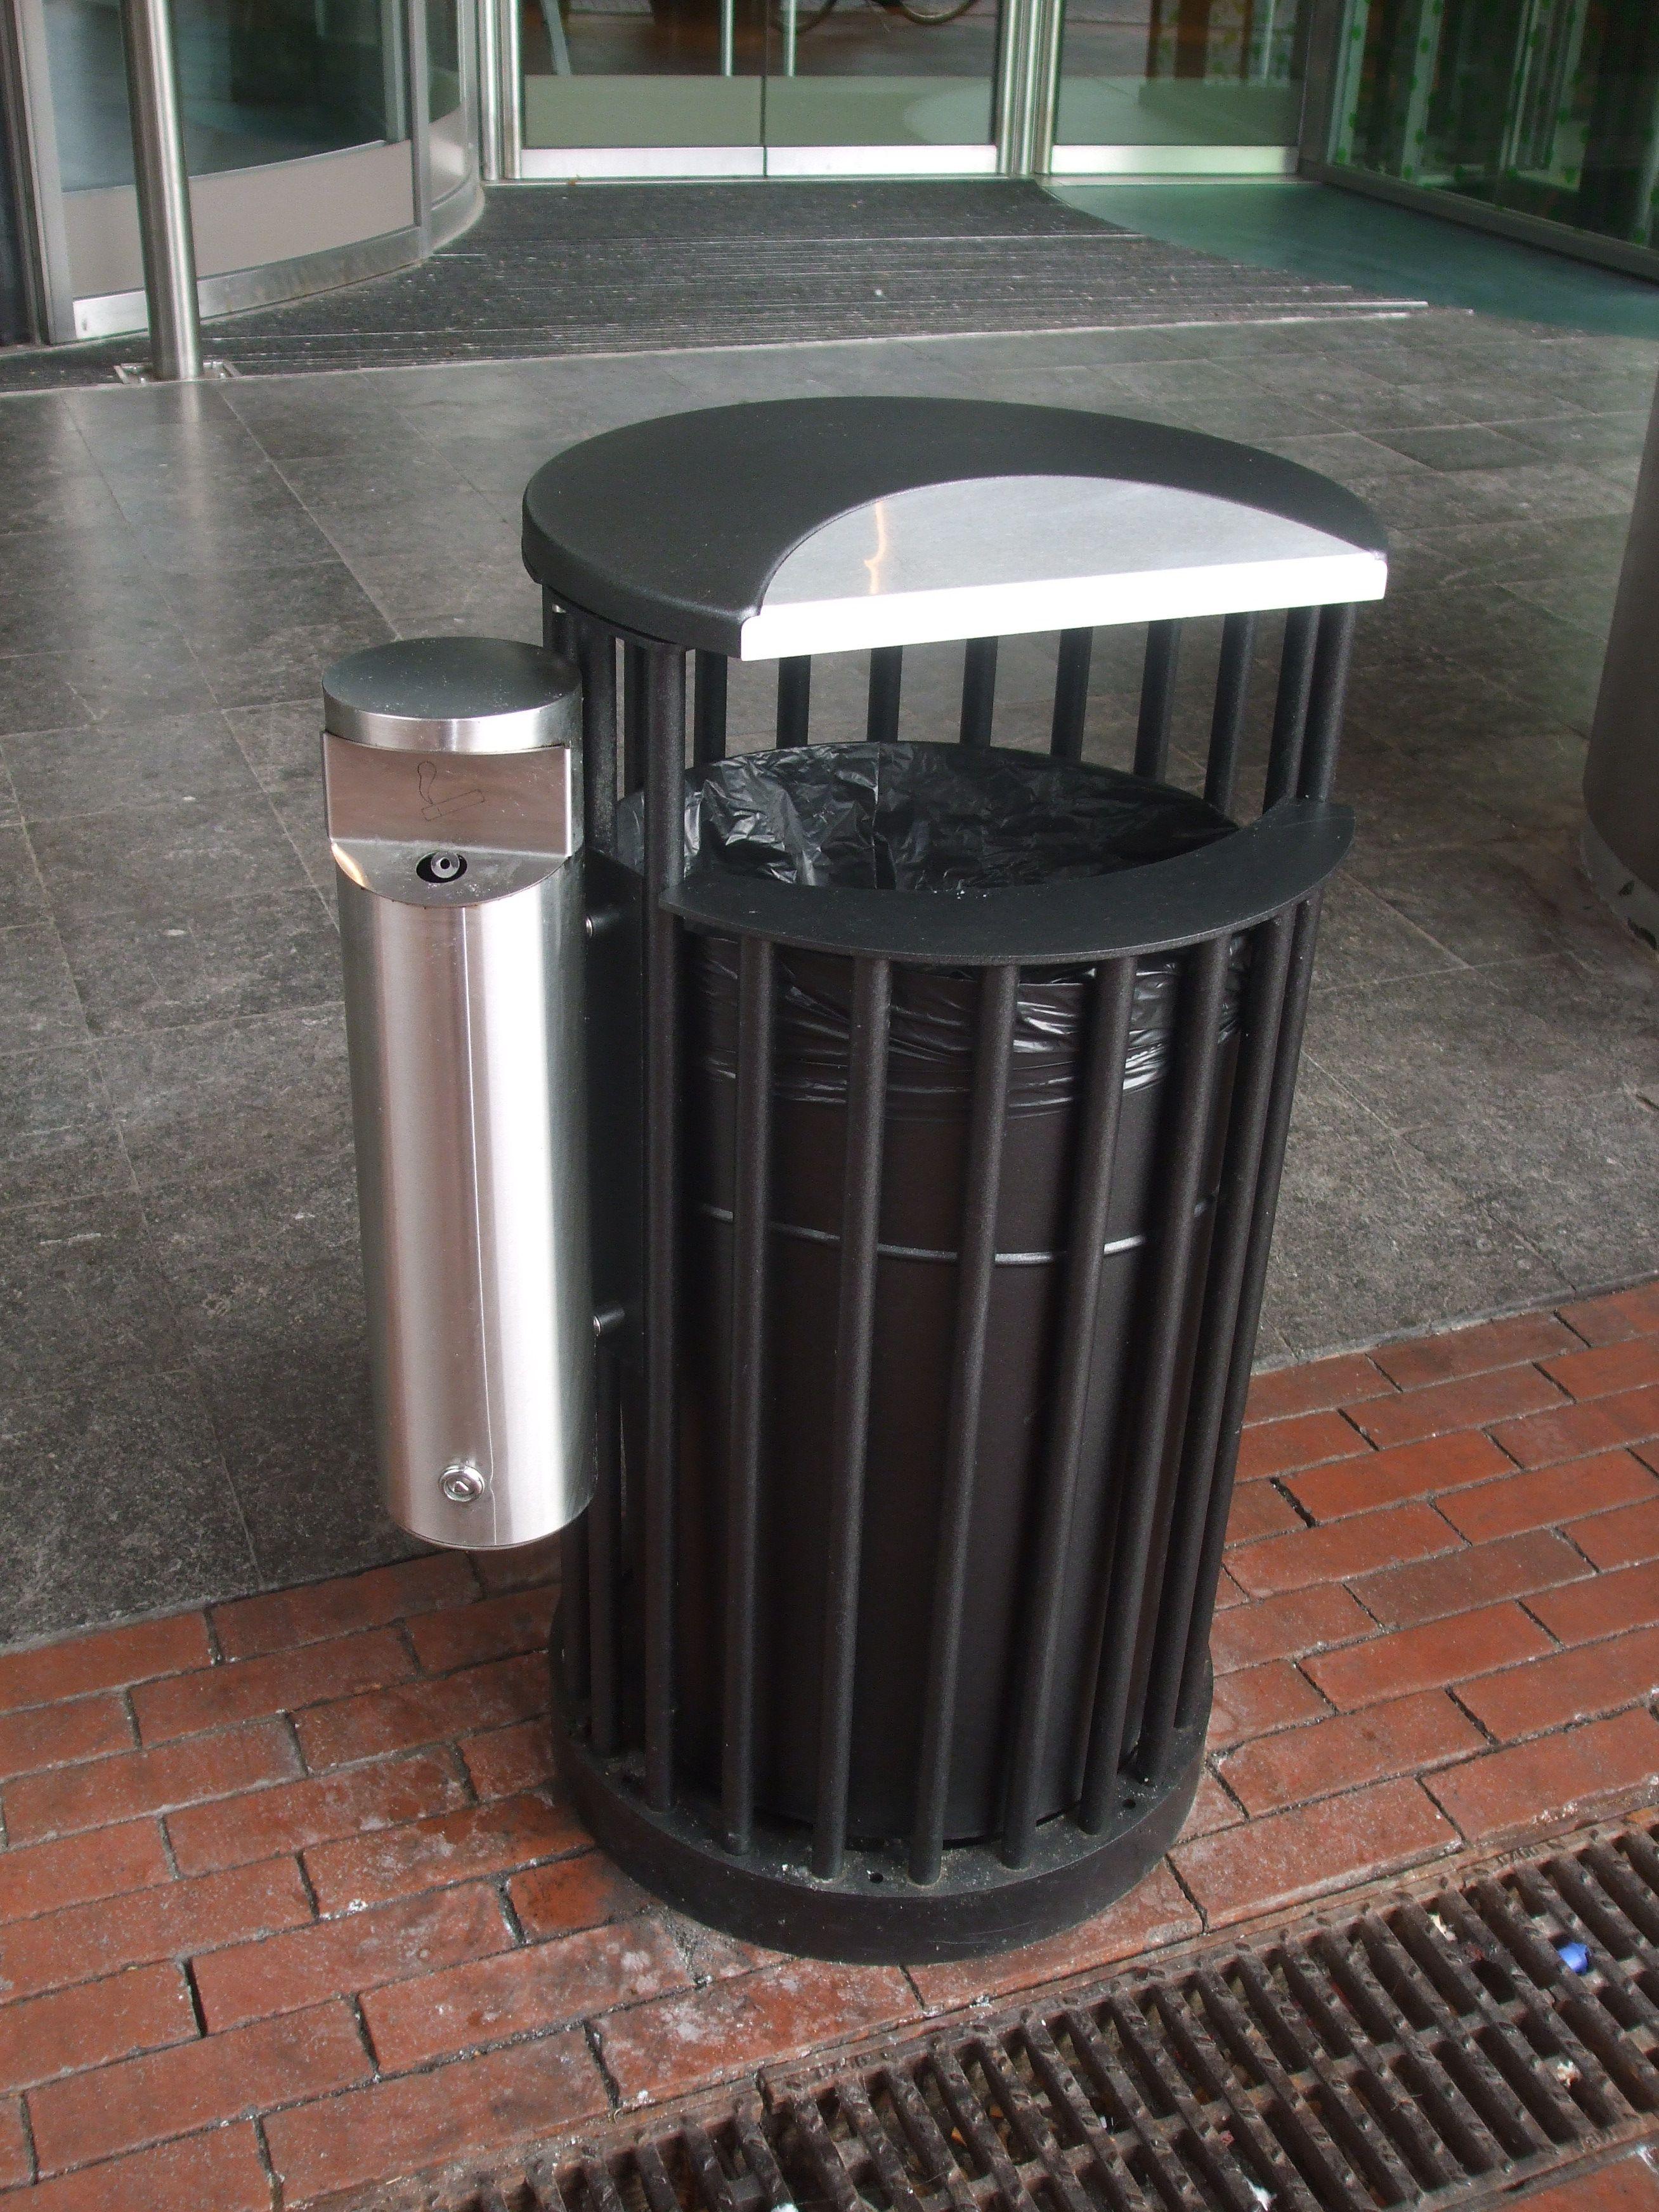 Public Trash Bin With Cigarette Garbage